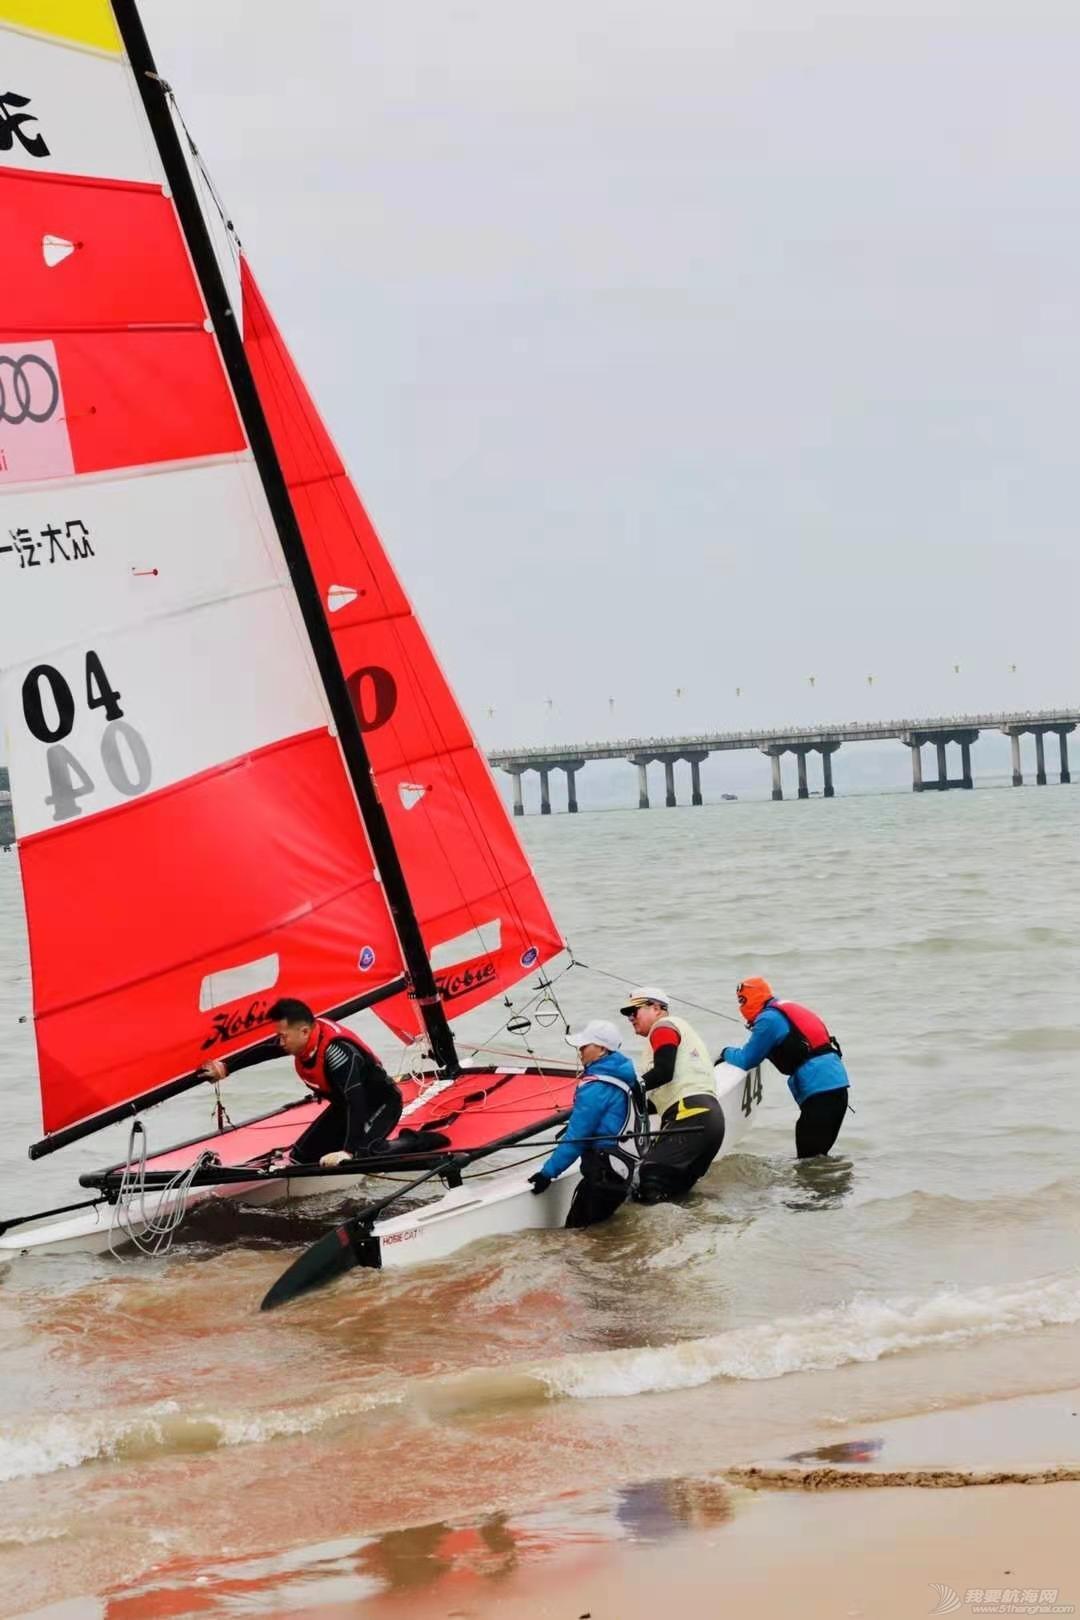 nbsp,广西,帆船,级别,岭南 你若喜欢海  我会一直浪  ——2020北部湾国际帆船公开赛Hobie级别回顾  111042ezbkkzquziumgmbb